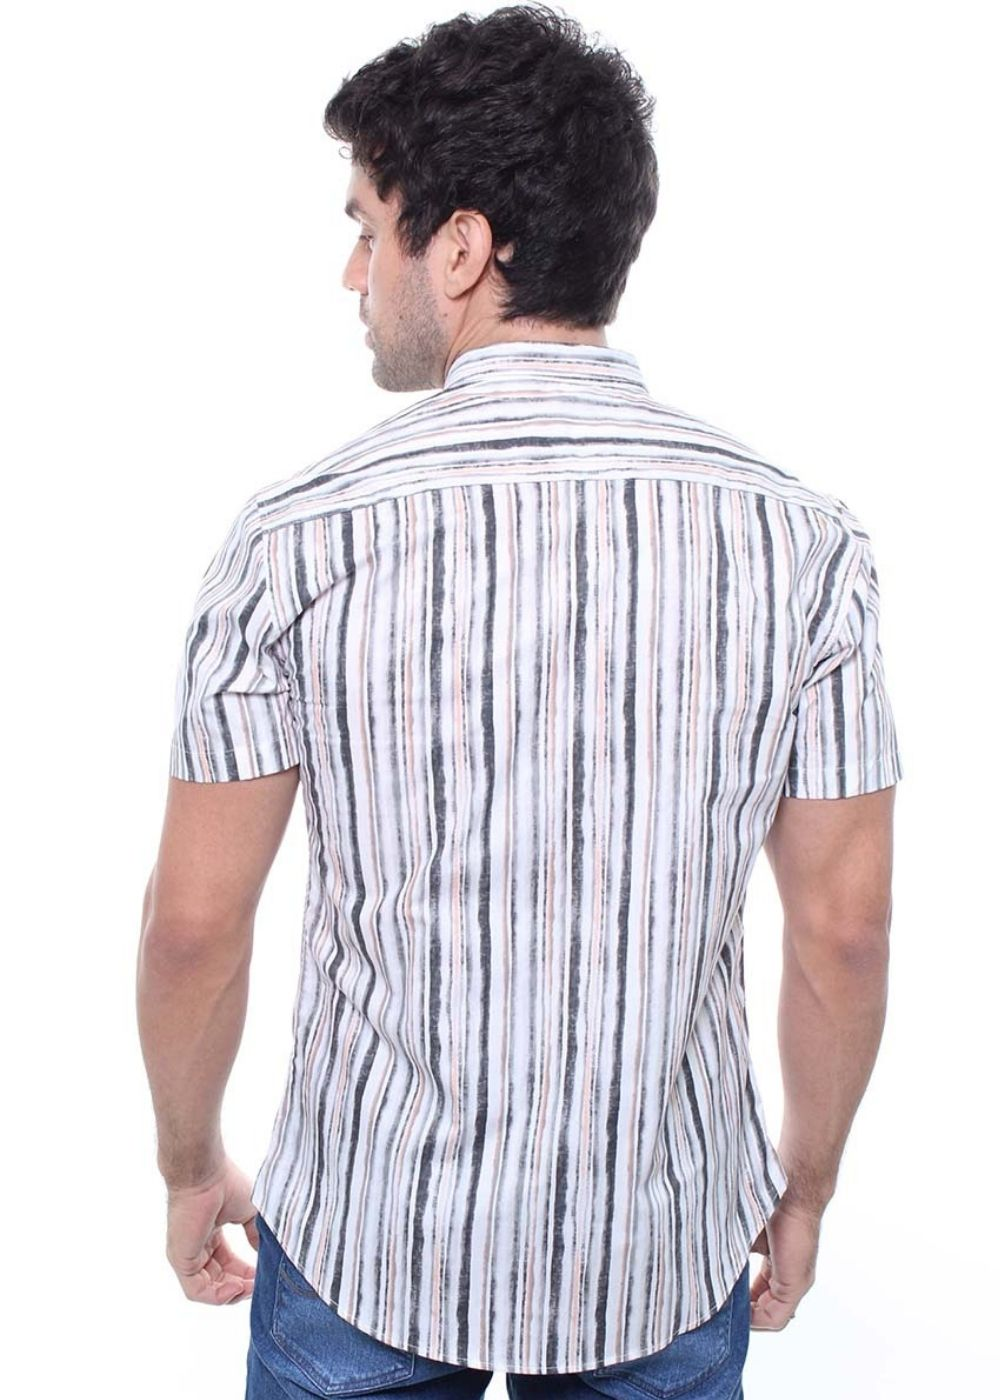 Camisa Estampada Masculina Manga Curta Crocker - 47829  - CROCKER JEANS